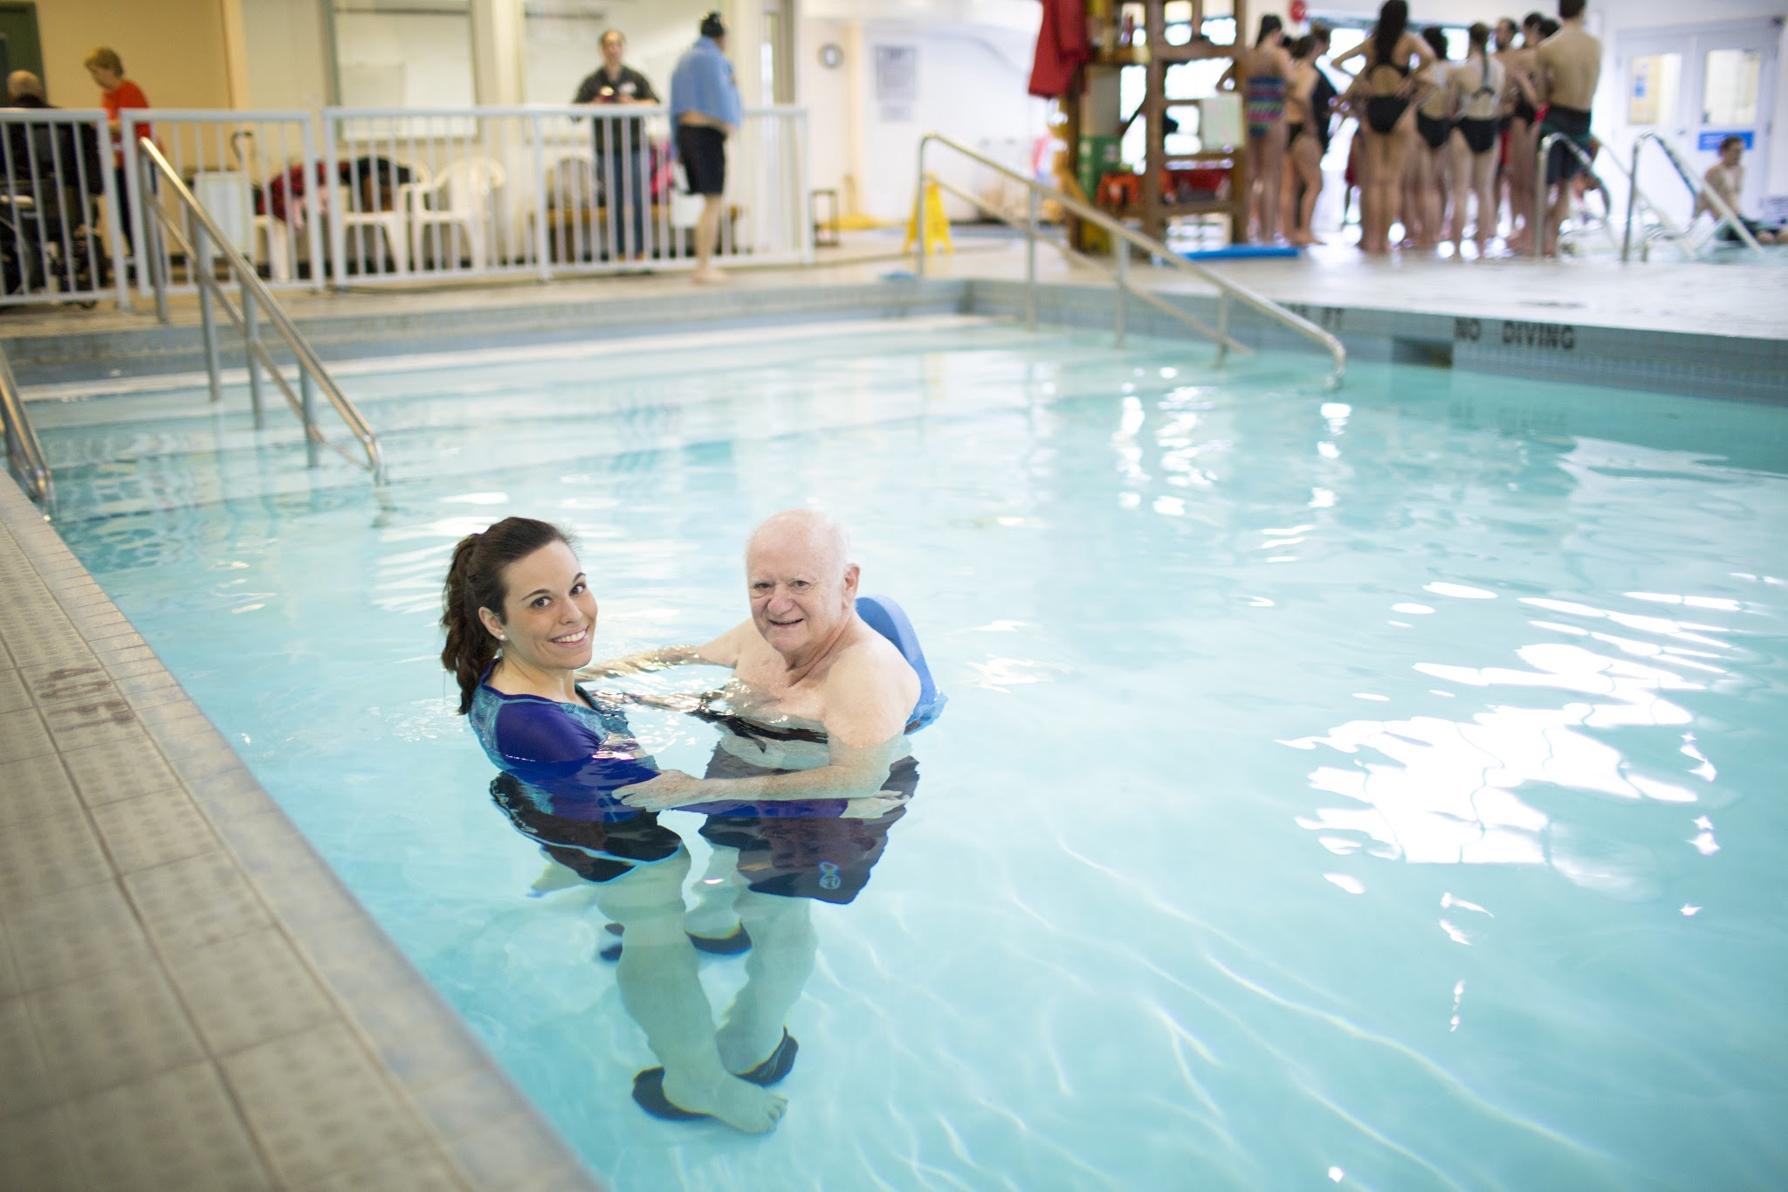 Nurse Next Door Home Care Services - Regina - Regina, SK S4P 2S3 - (306)209-0699 | ShowMeLocal.com